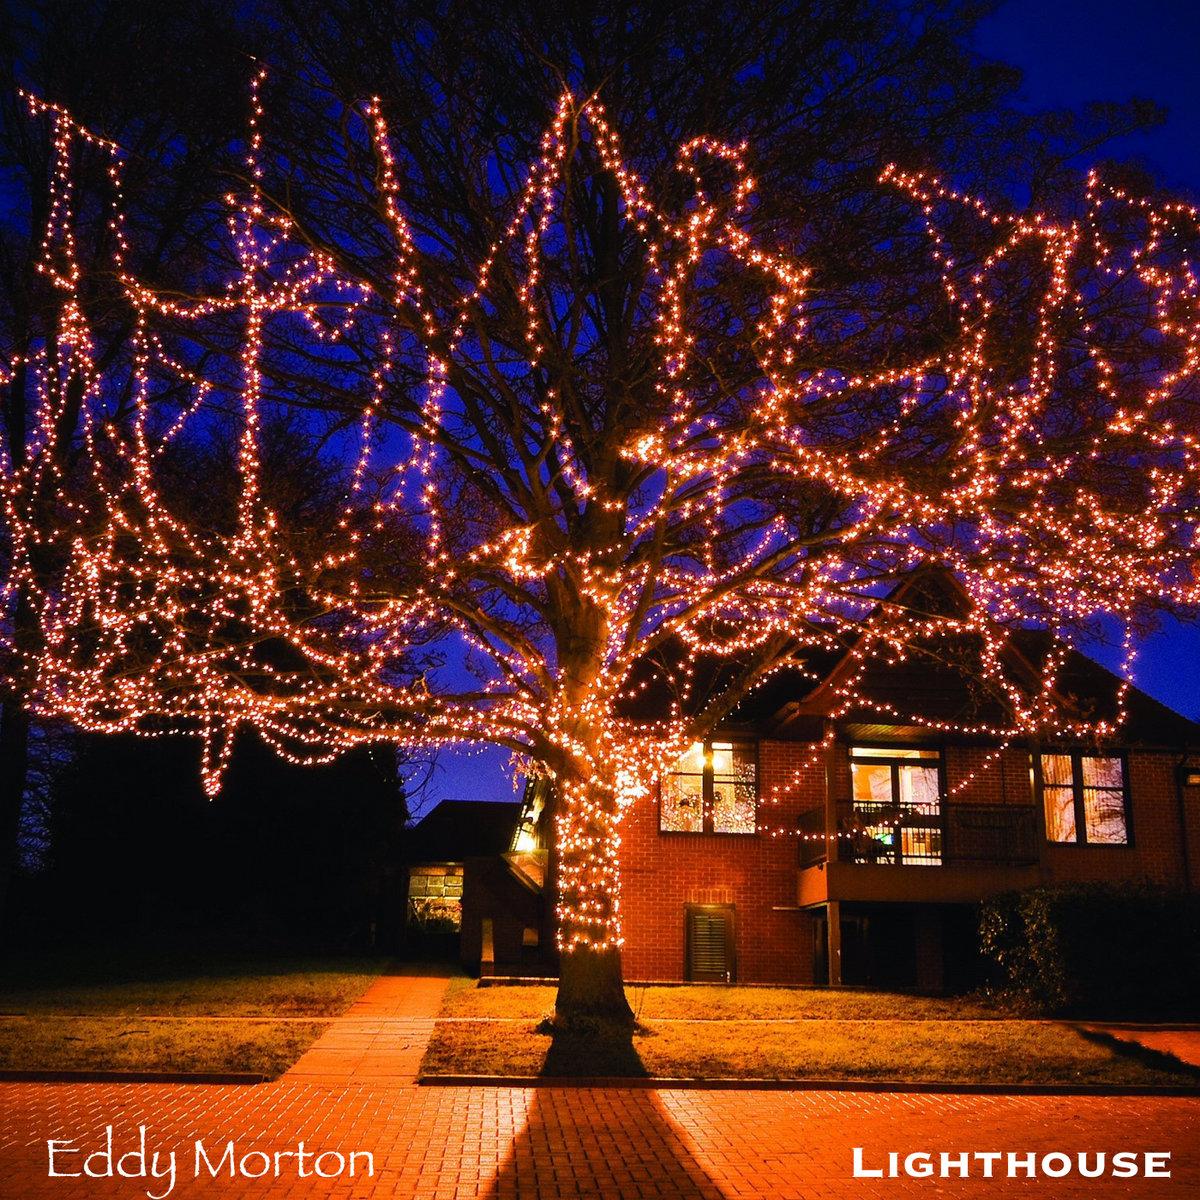 Lighthouse Eddy Morton